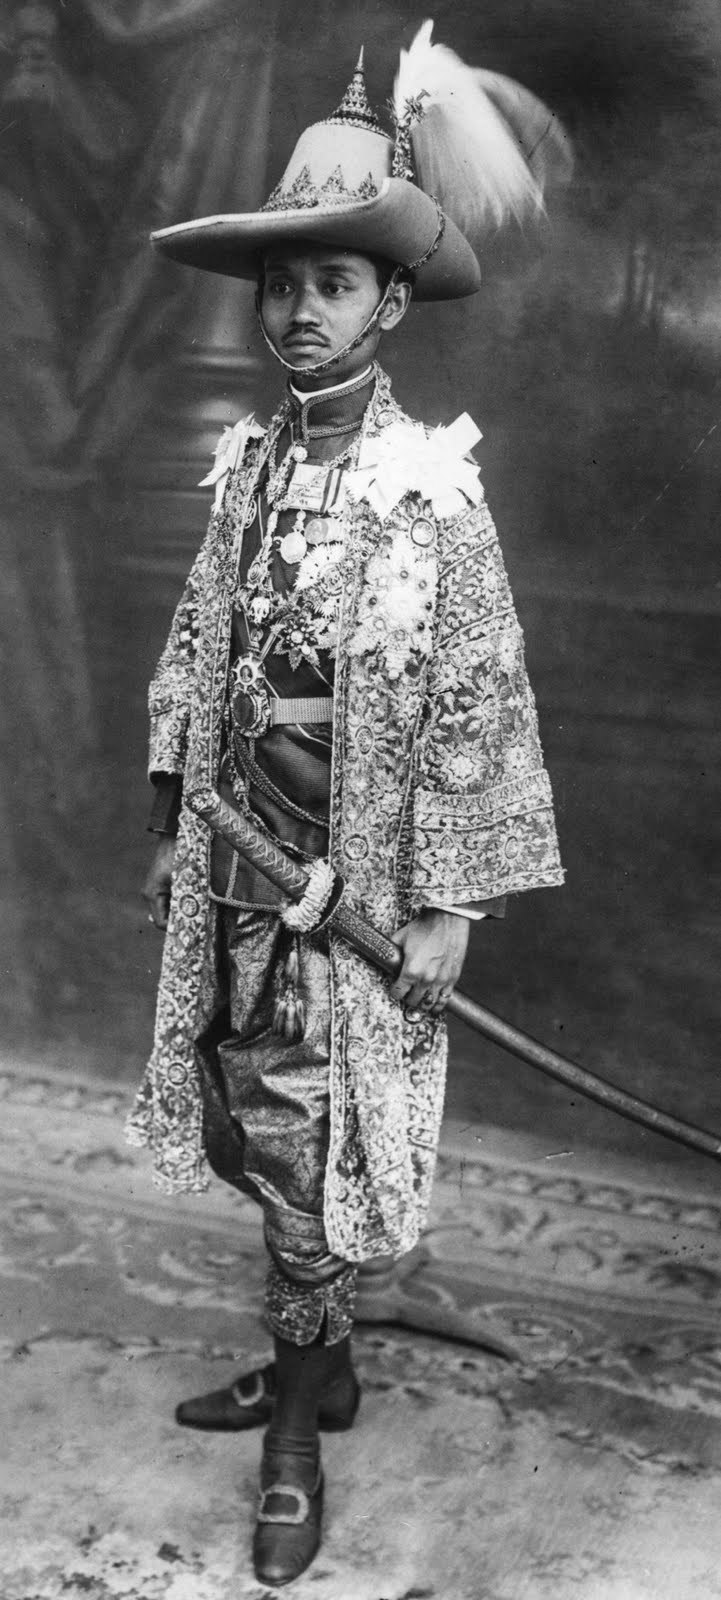 King Prajadhipok (Rama VII) of Siam